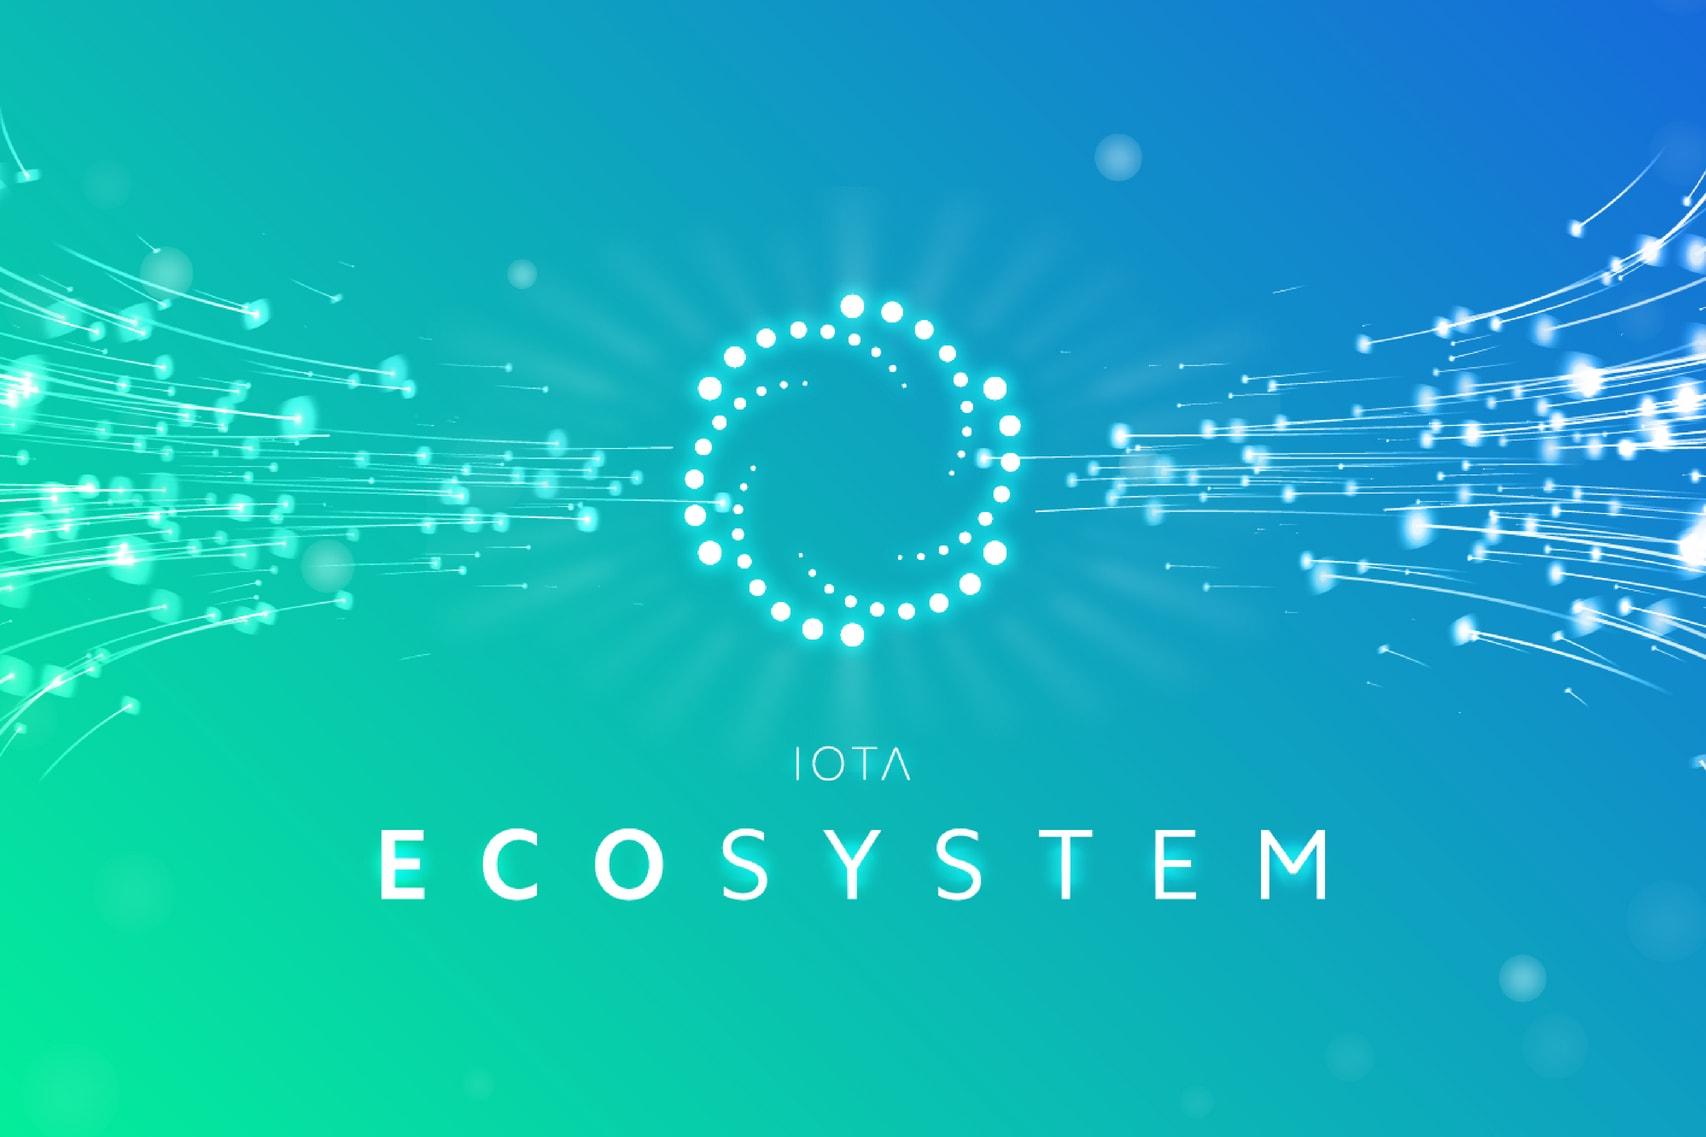 iotaecosystem